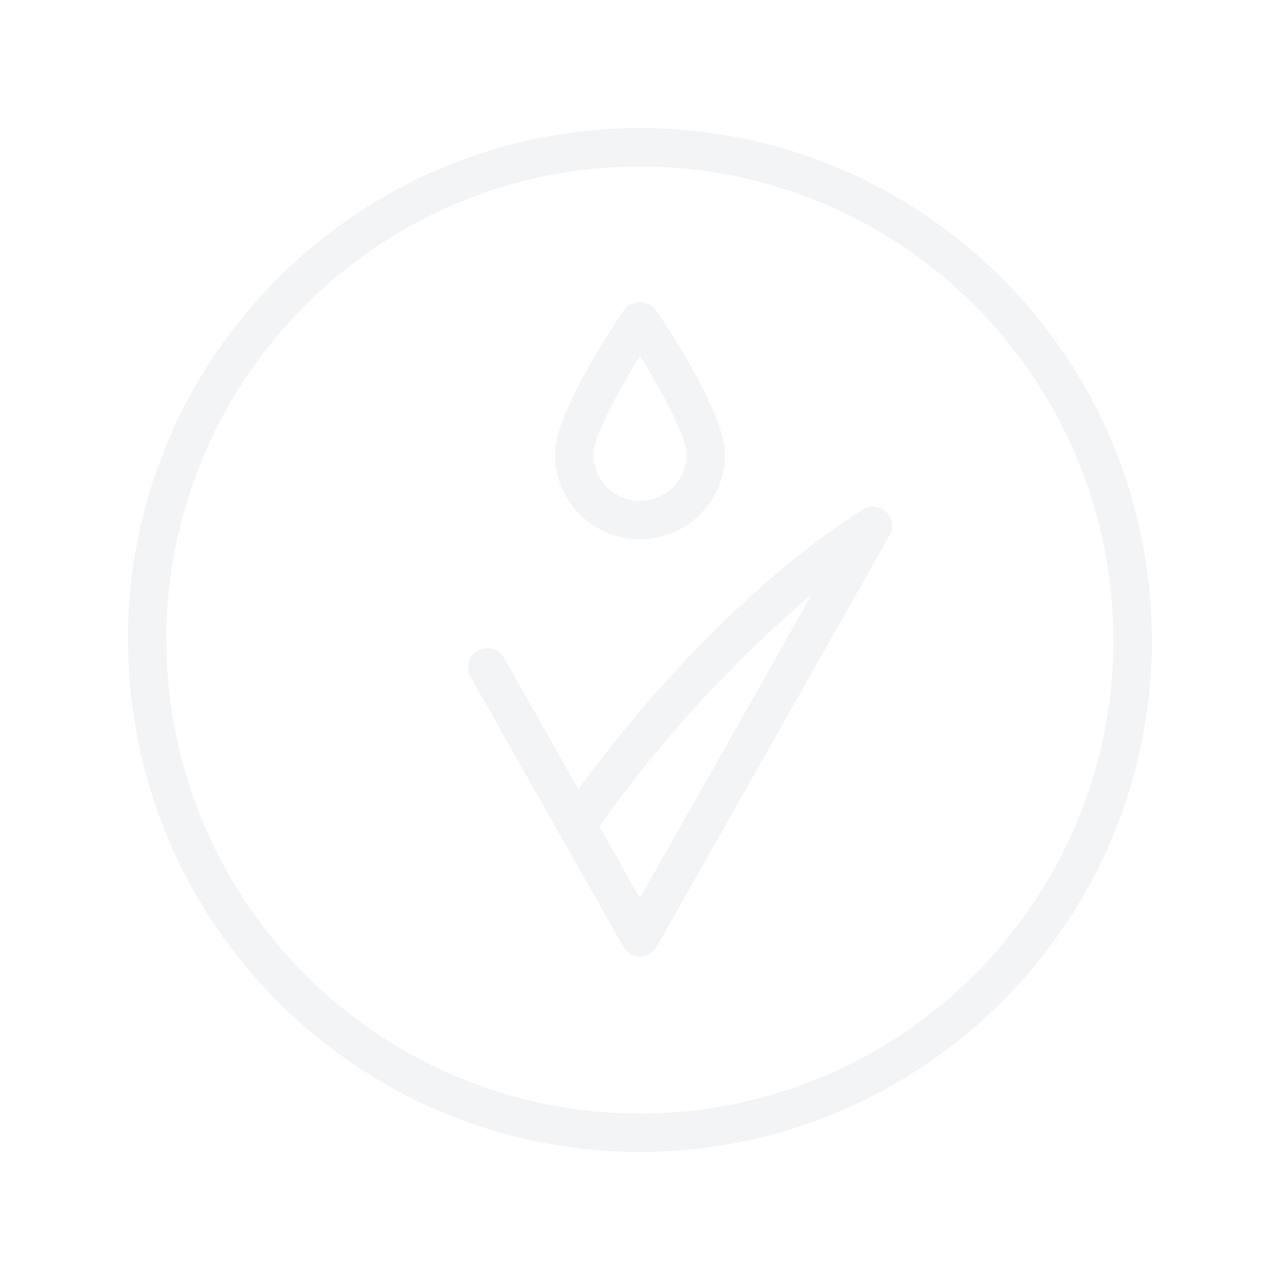 Dolce & Gabbana Dolce 50ml Eau De Parfum Gift Set